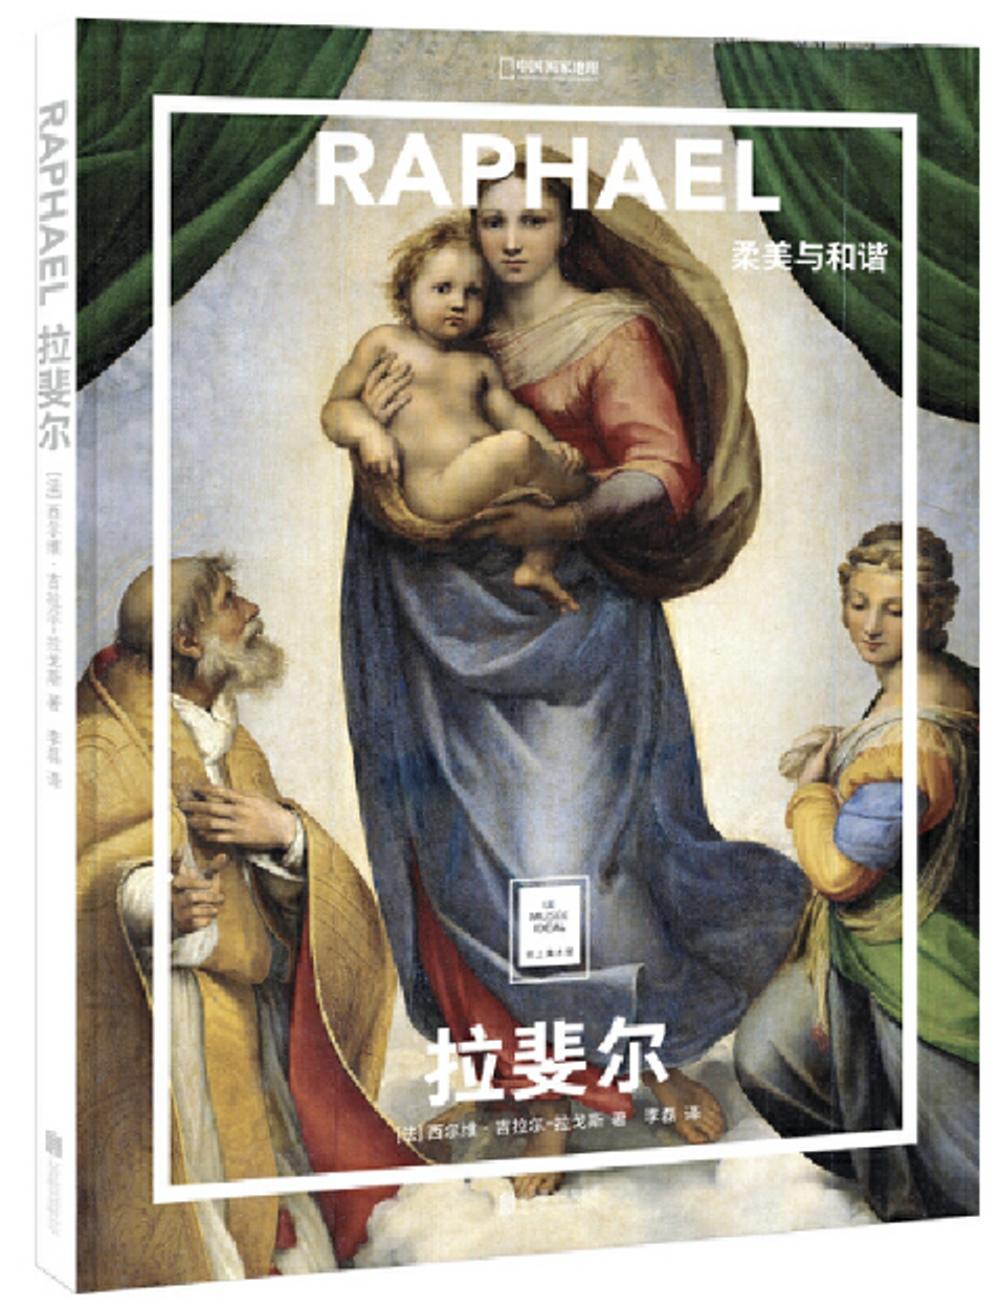 RAPHAEL拉斐爾:柔美與和諧